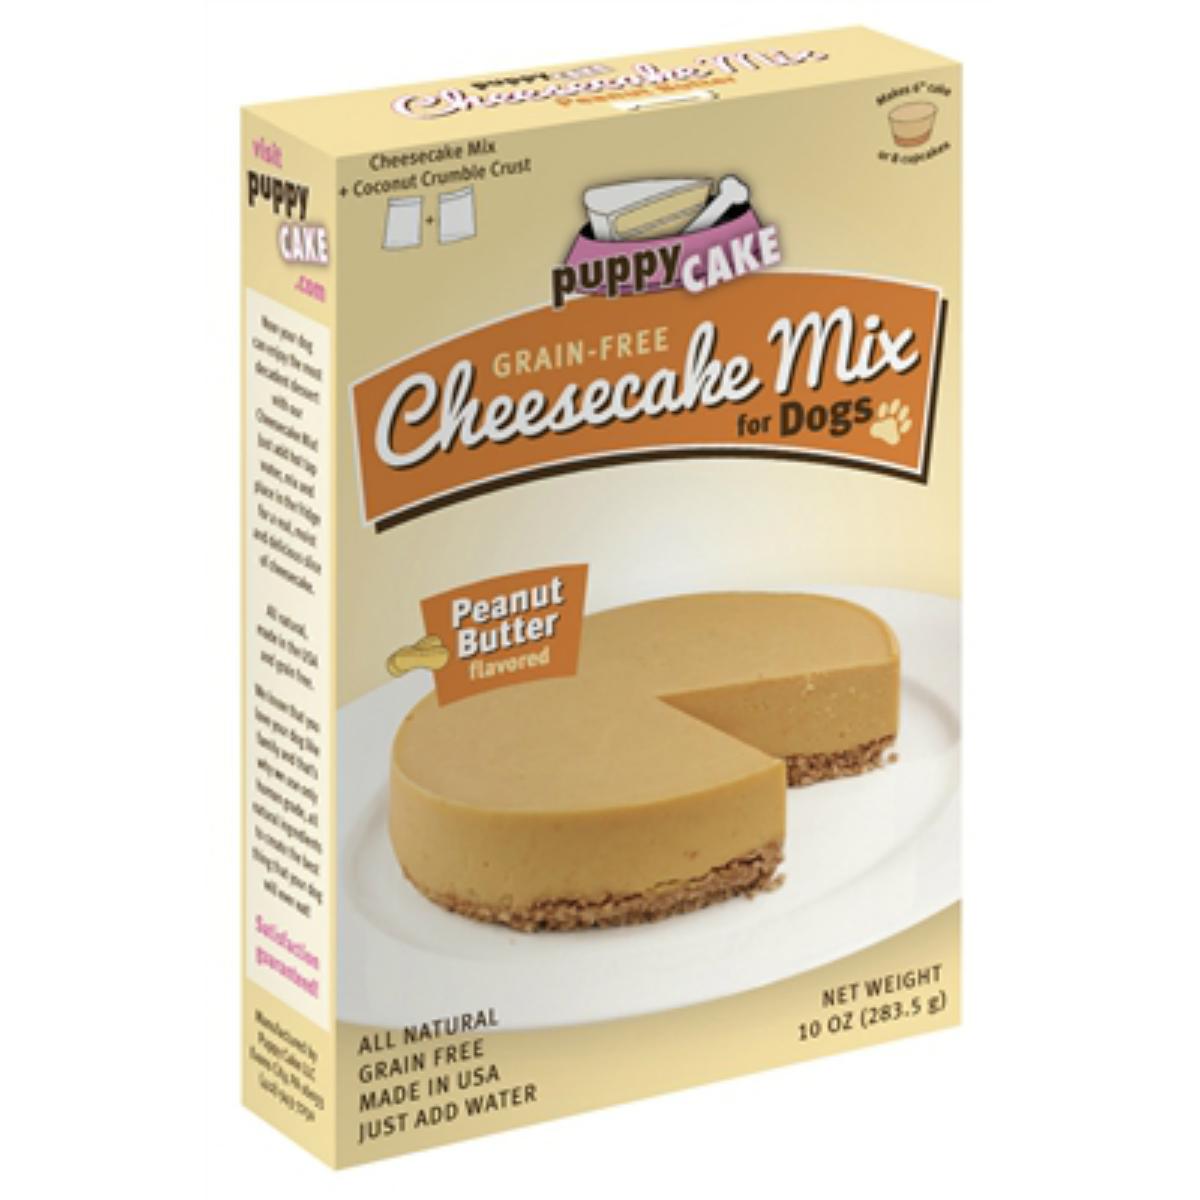 Cheesecake Puppy Cake Mix Dog Treat Peanut Baxterboo